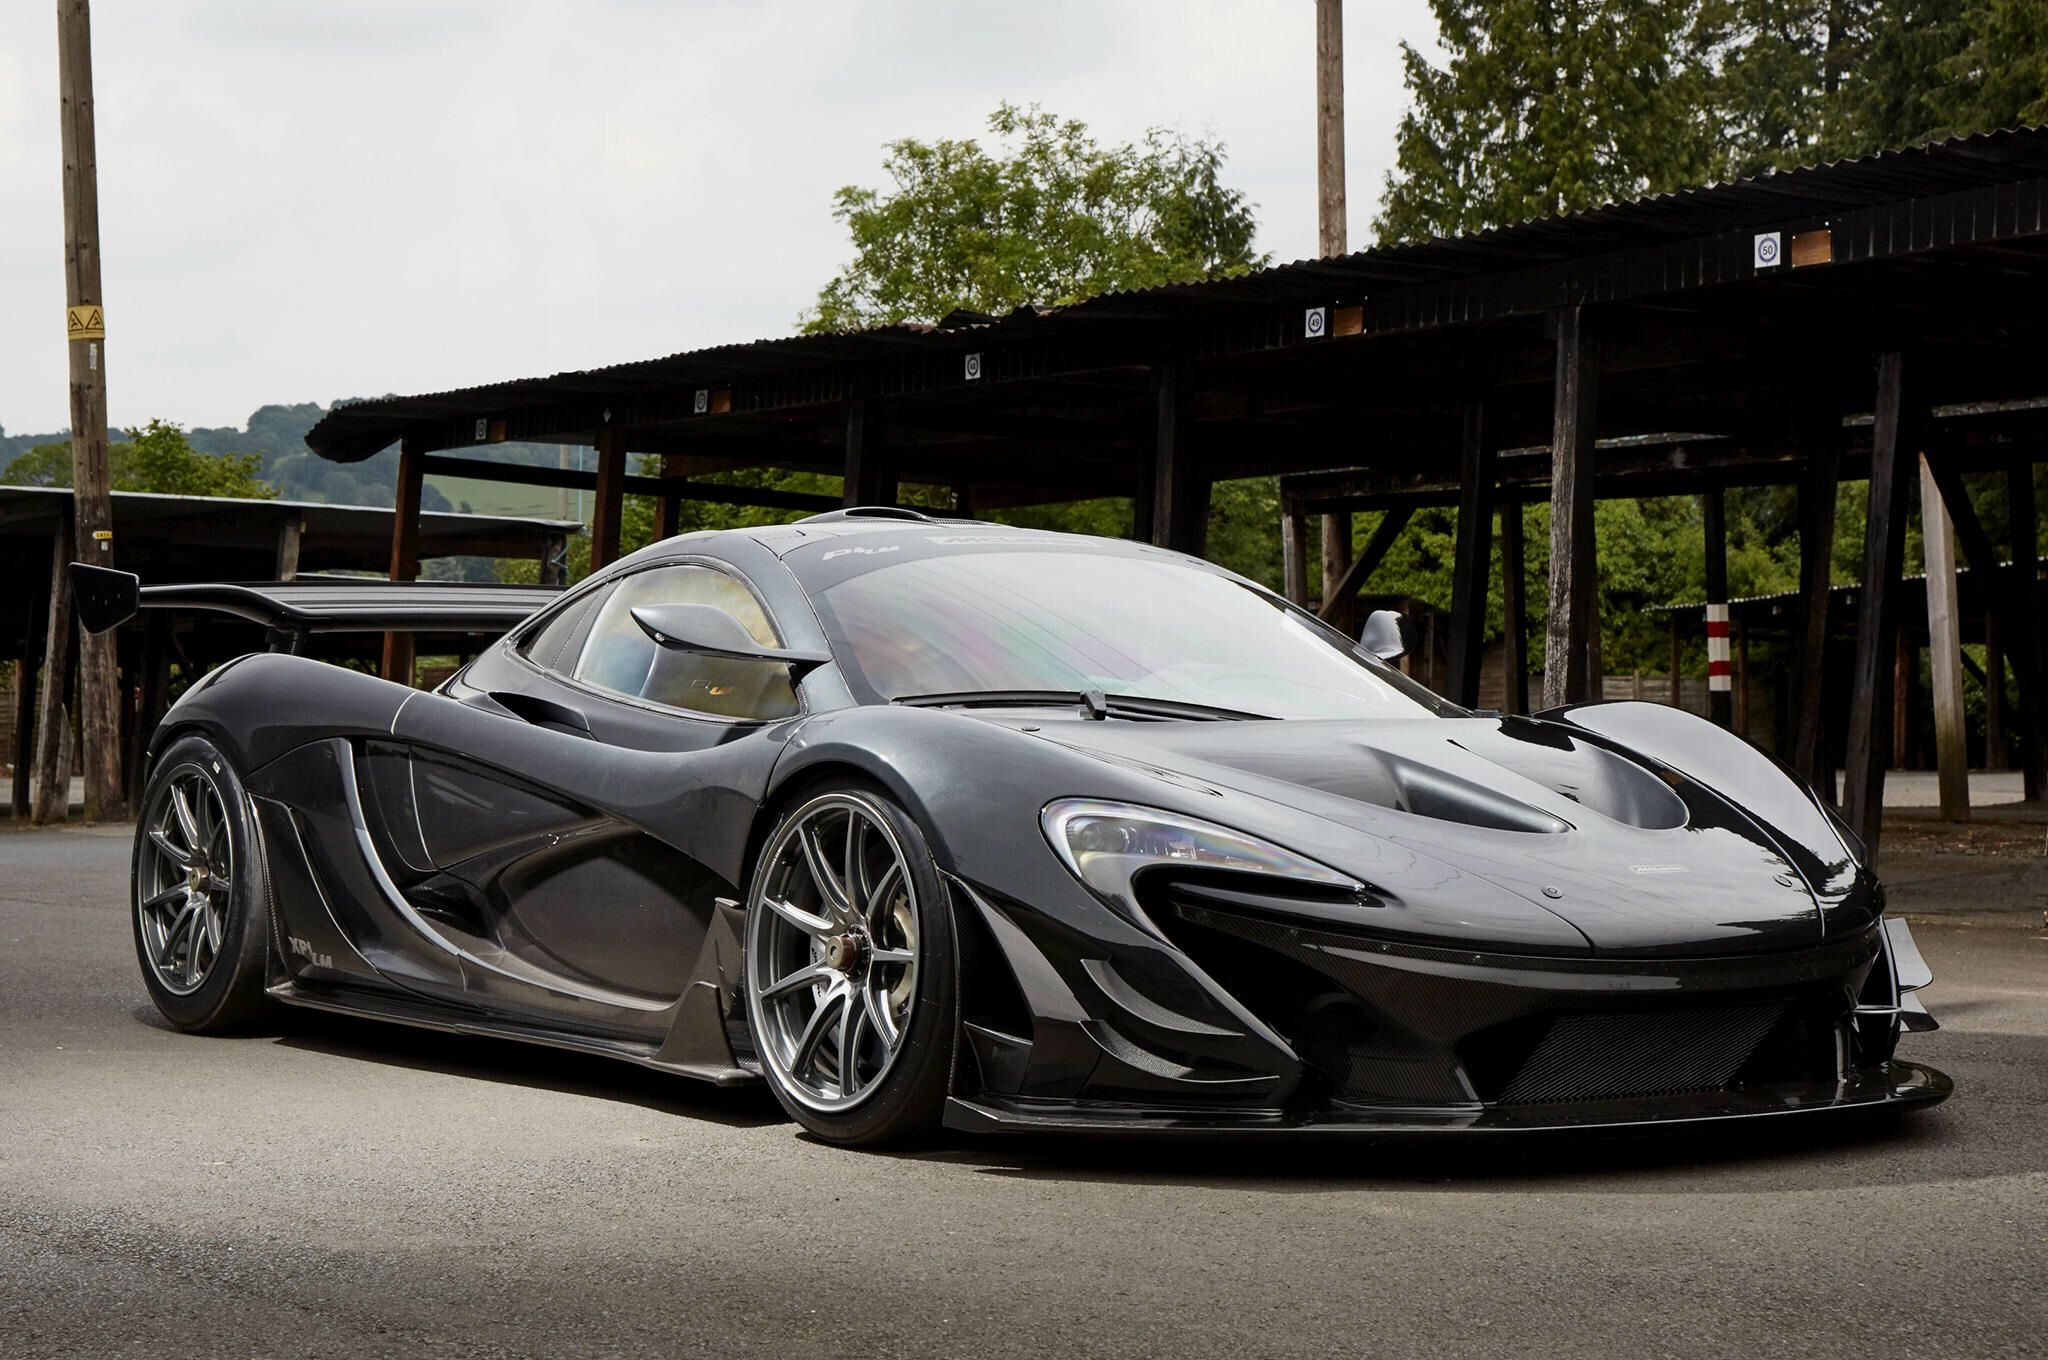 Mclaren 570s Sprint Is The Trackday Car Of Your Dreams Mclaren P1 Mclaren Cars Most Expensive Car